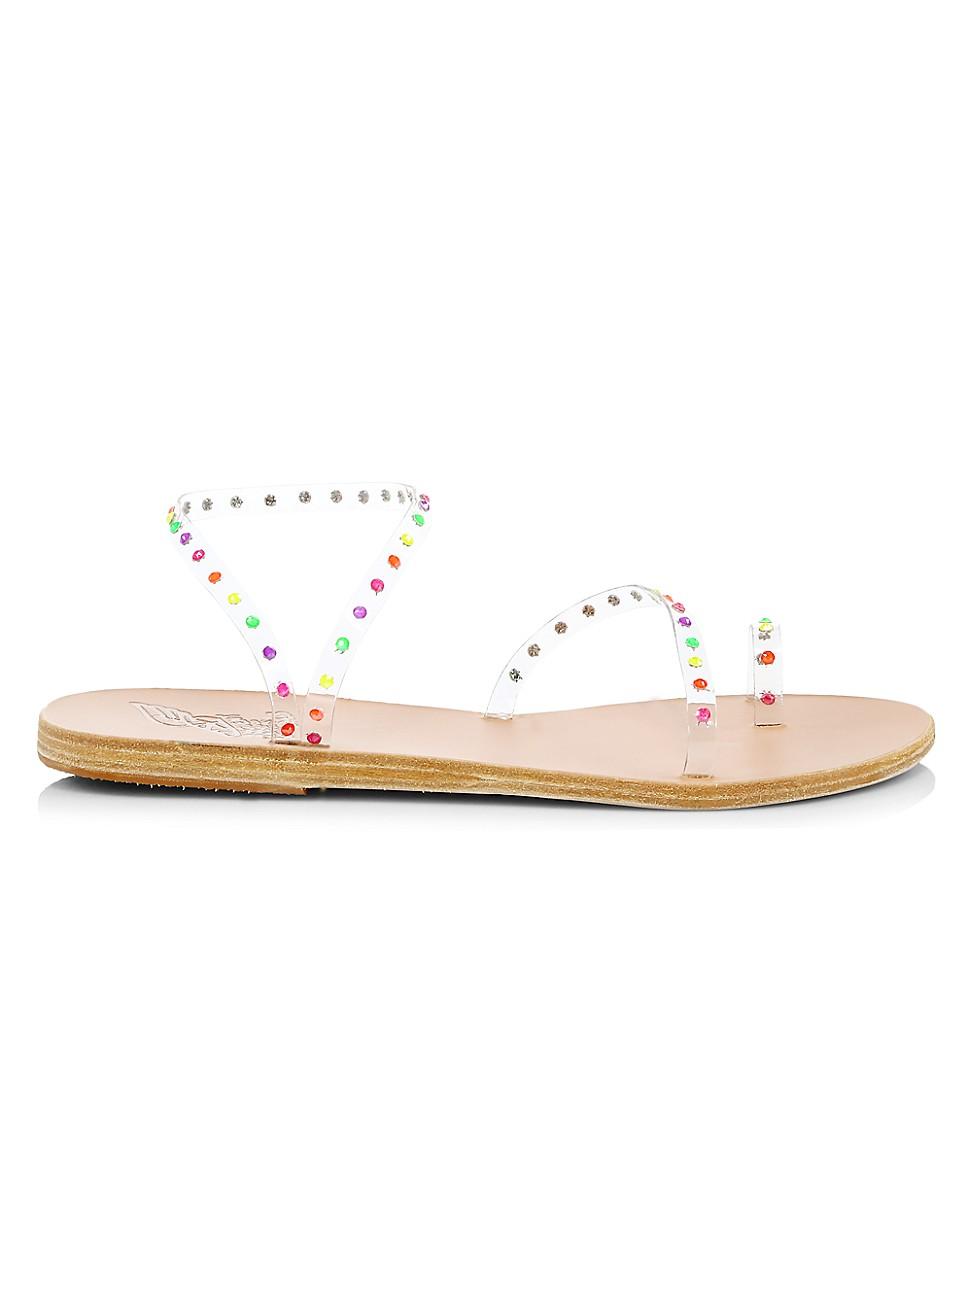 Ancient Greek Sandals WOMEN'S APLI ELEFTHERIA CRYSTAL-EMBELLISHED VINYL SANDALS